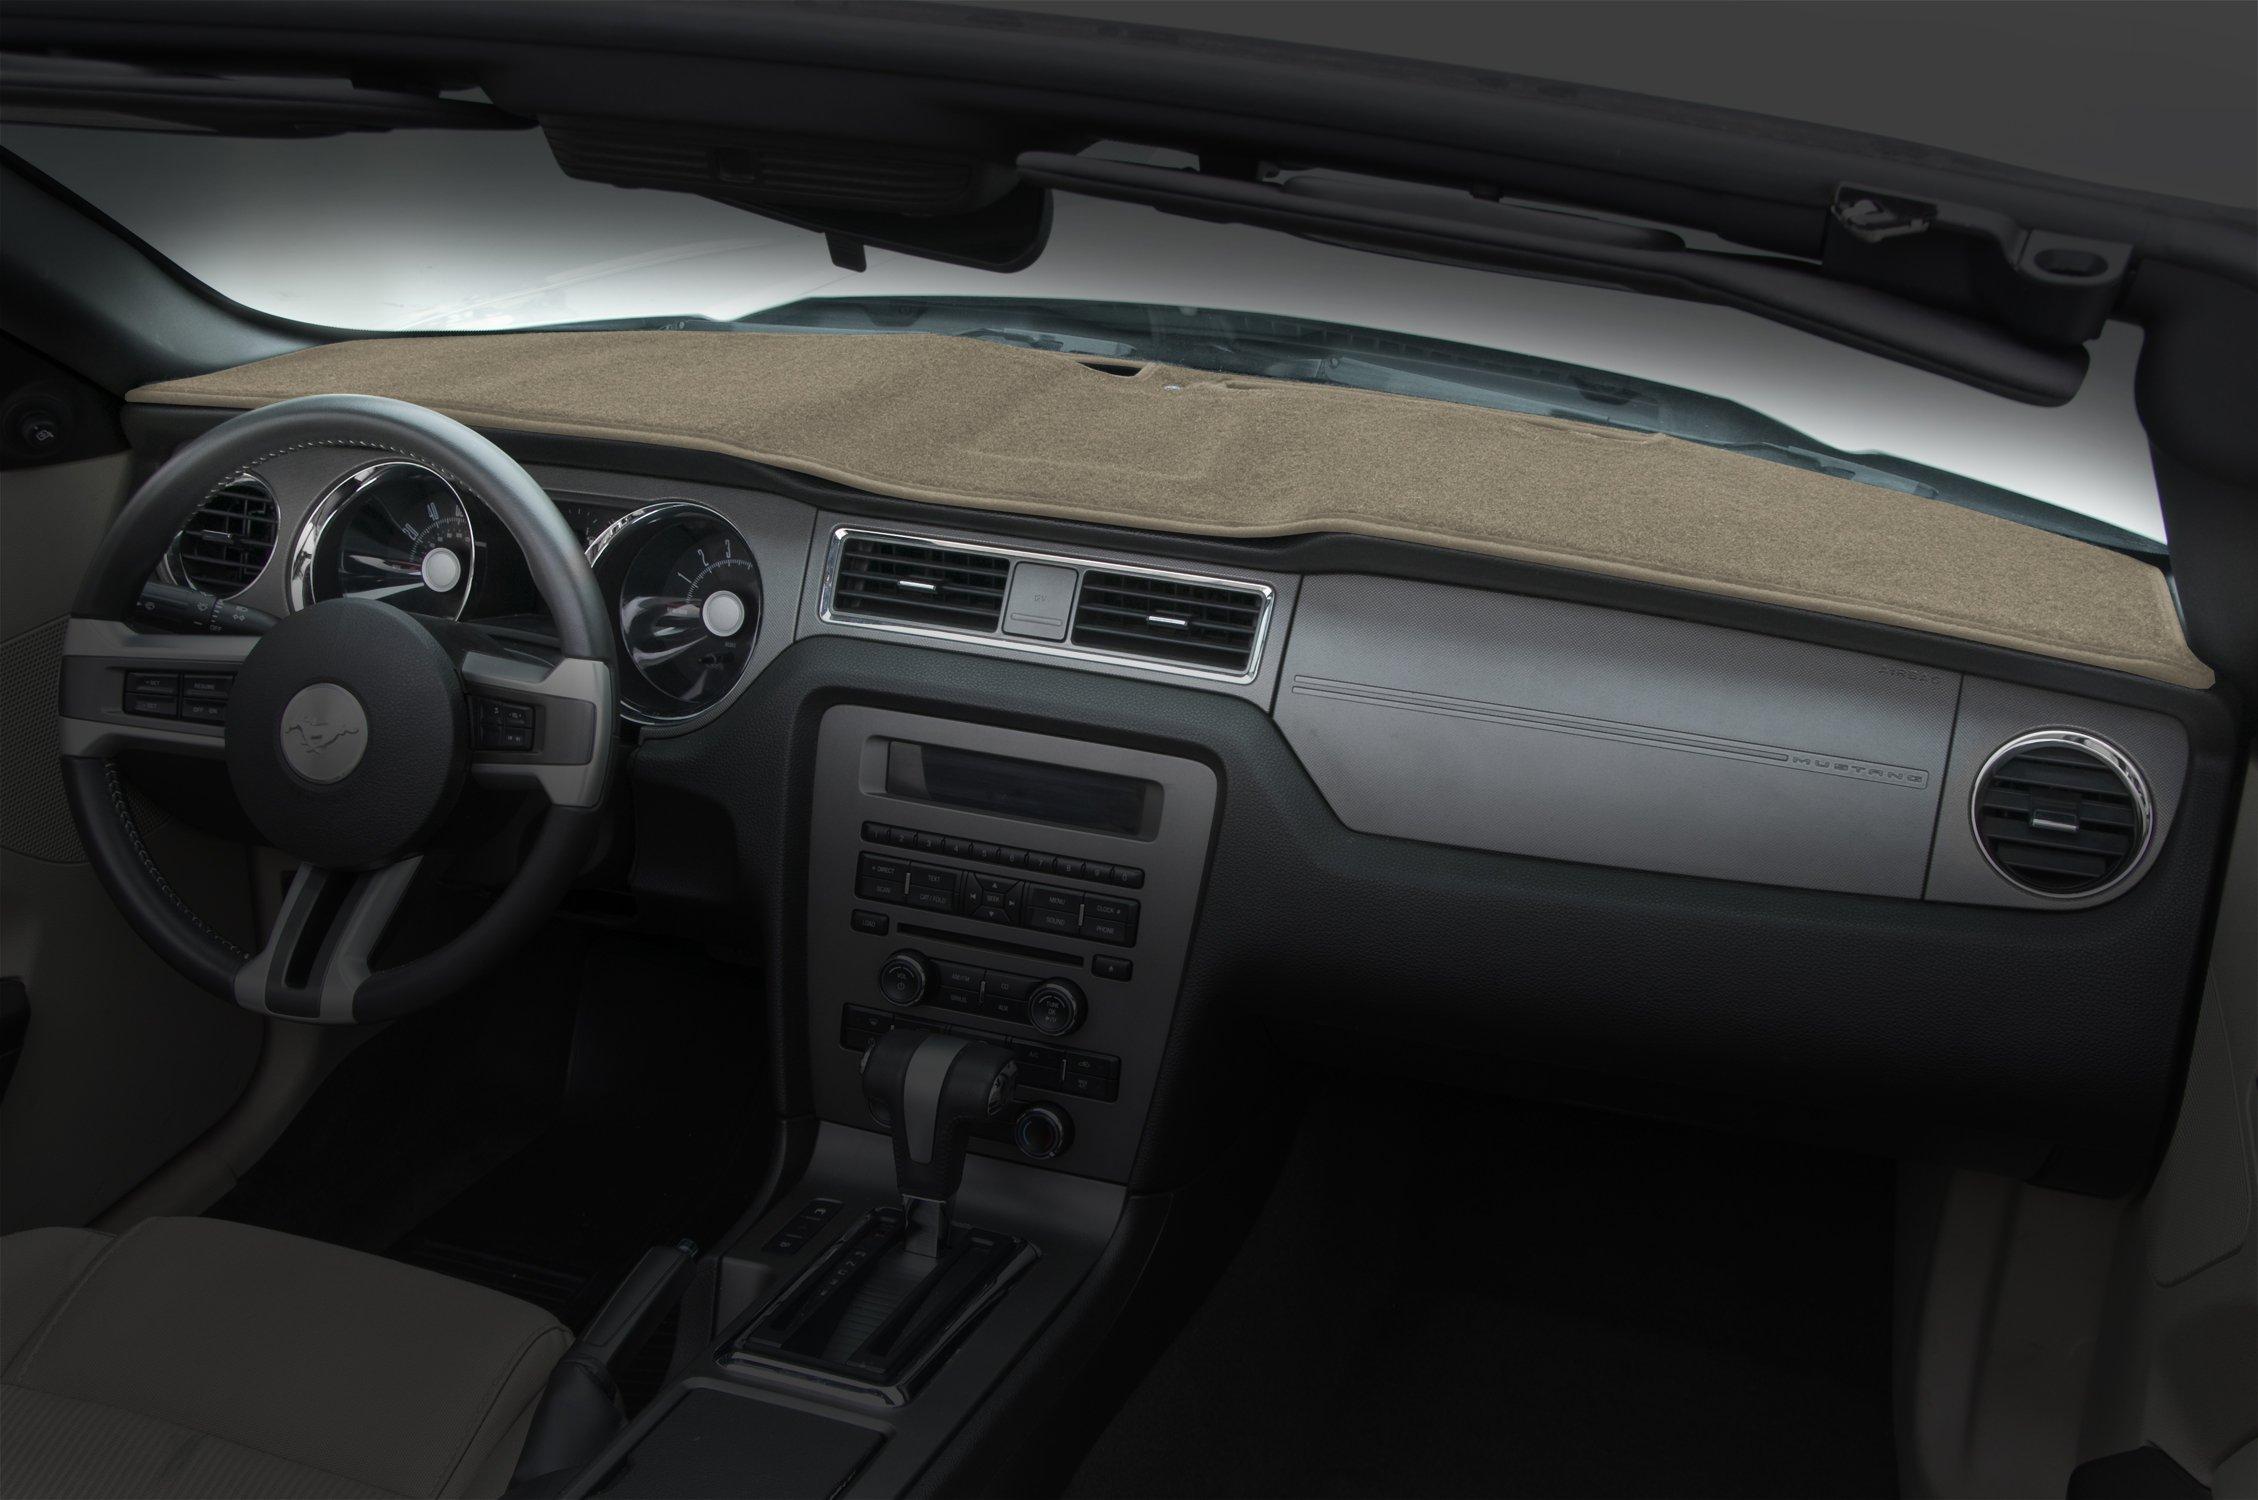 Coverking Custom Fit Dashcovers for Select Pontiac Torrent Models - Poly Carpet (Beige)